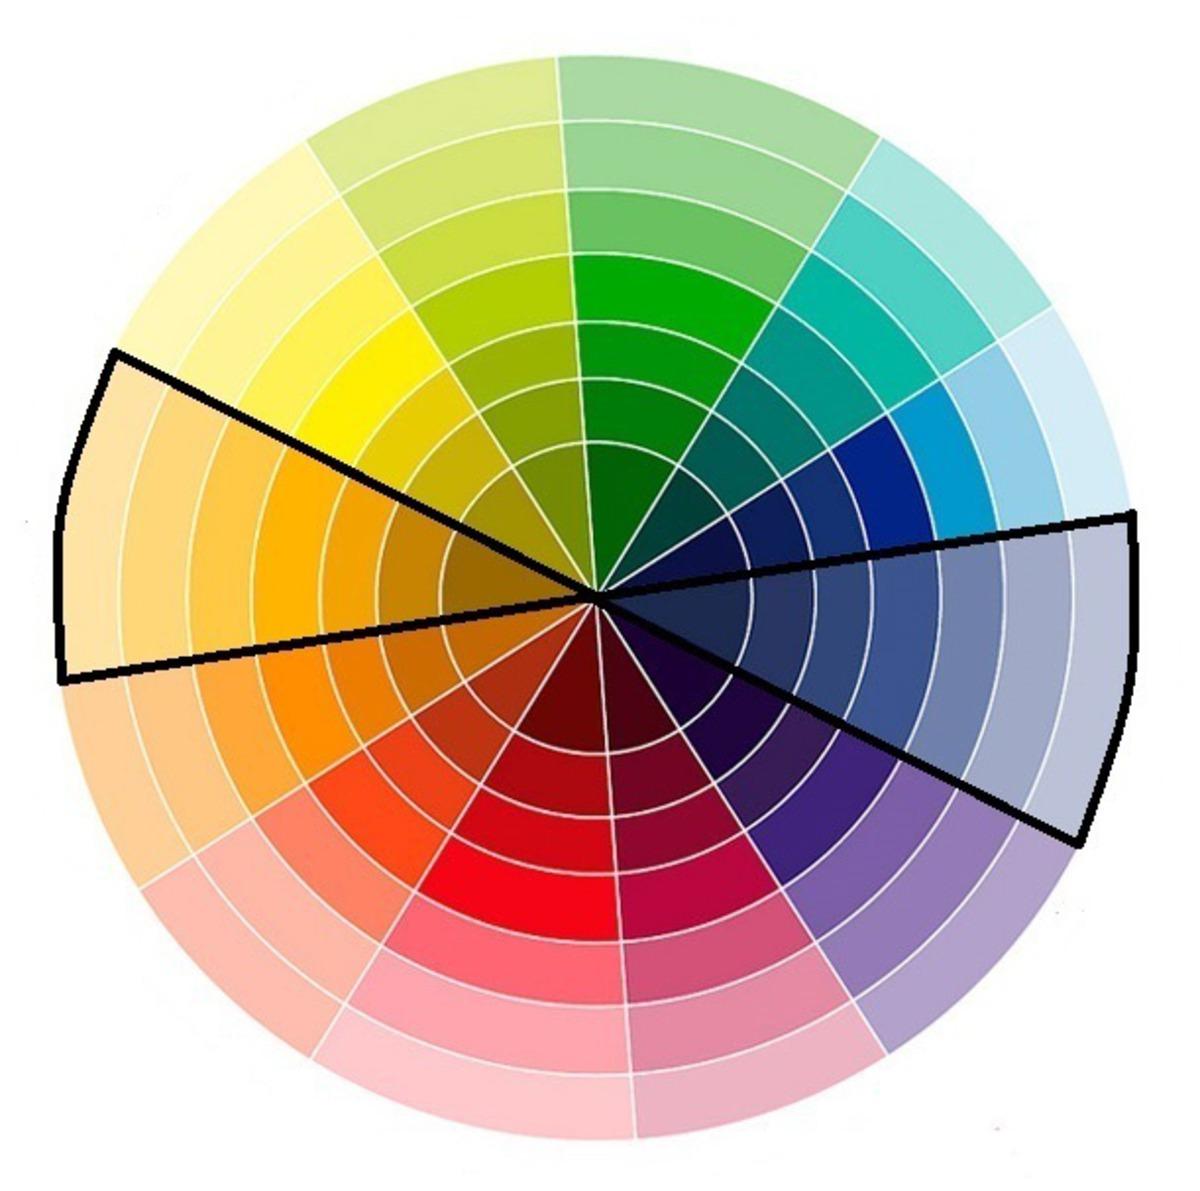 harmonia-de-cores-complementar-circulo-cromático